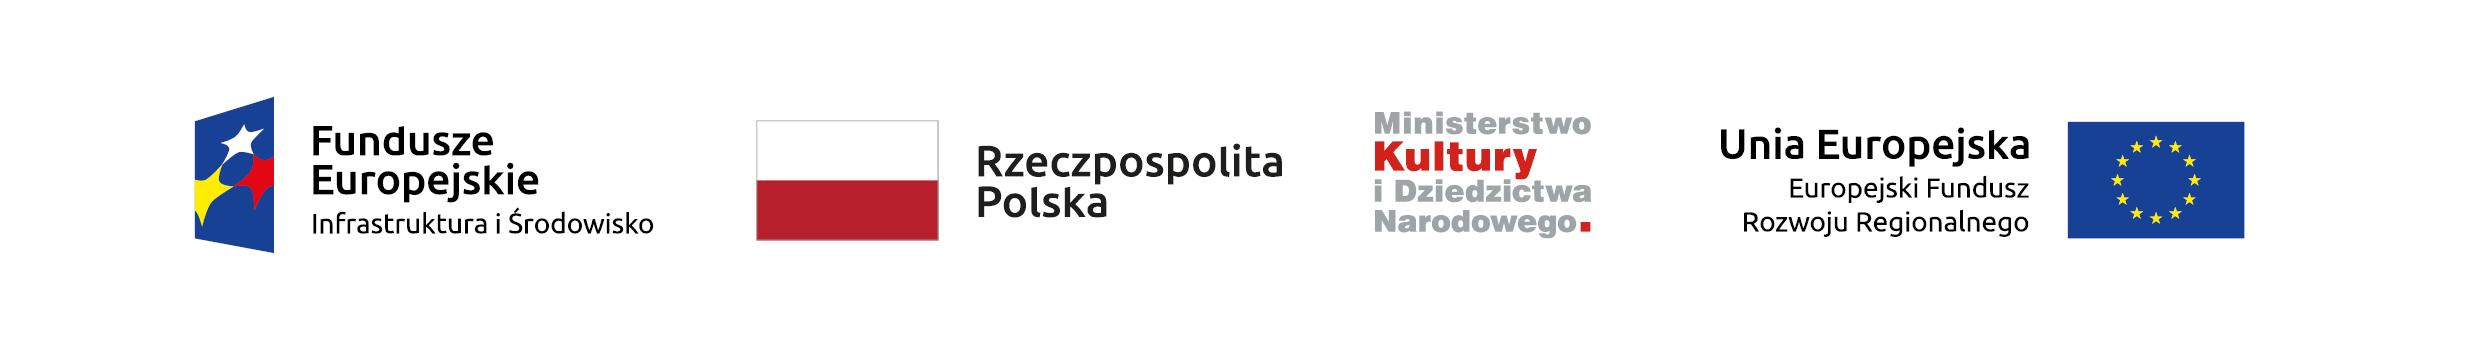 belka_informacja o finansowaniu